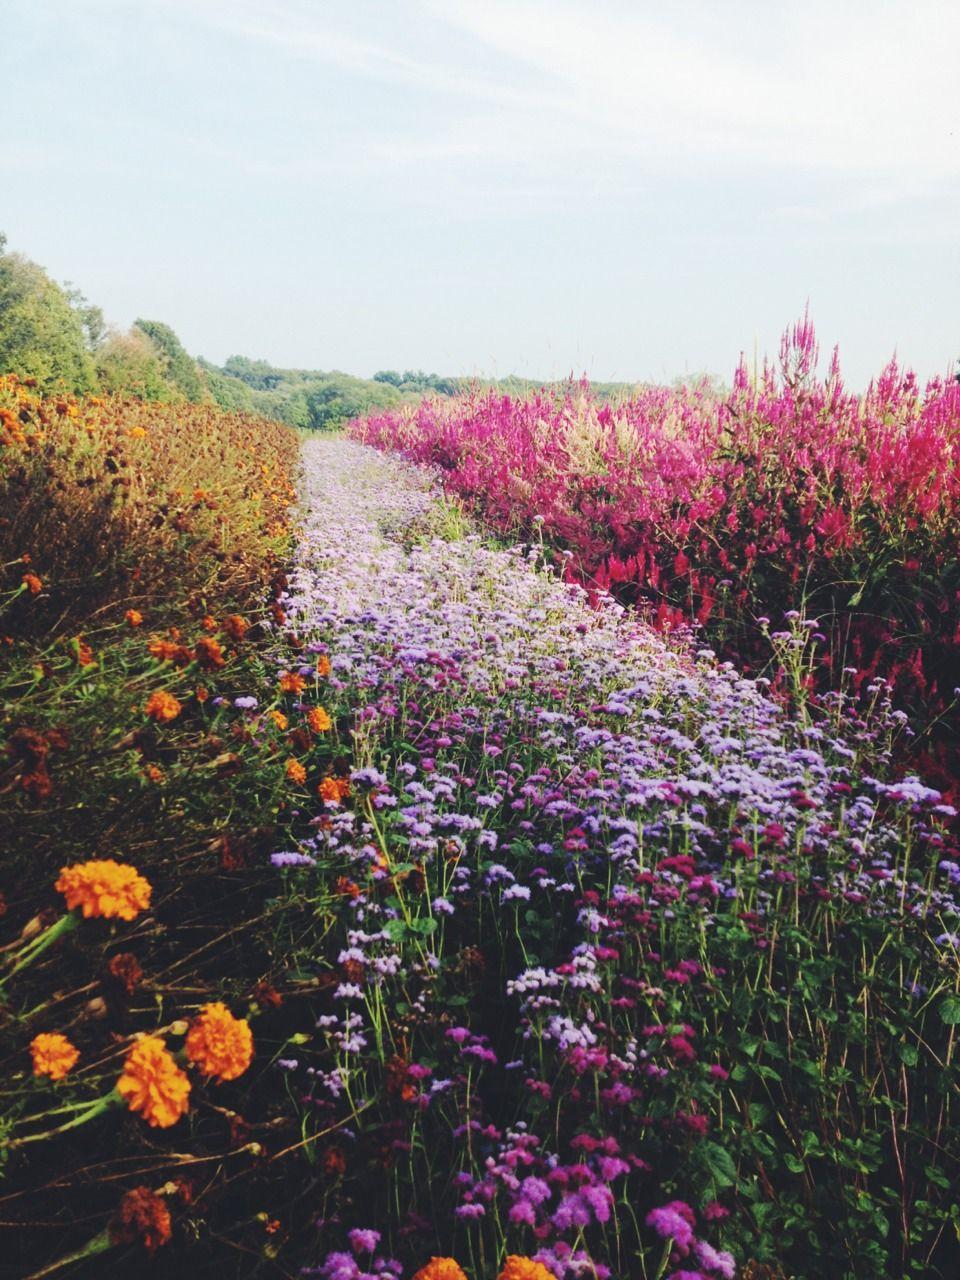 Field of flowers via sammaycreatetumblr christinas flower field of flowers via sammaycreatetumblr izmirmasajfo